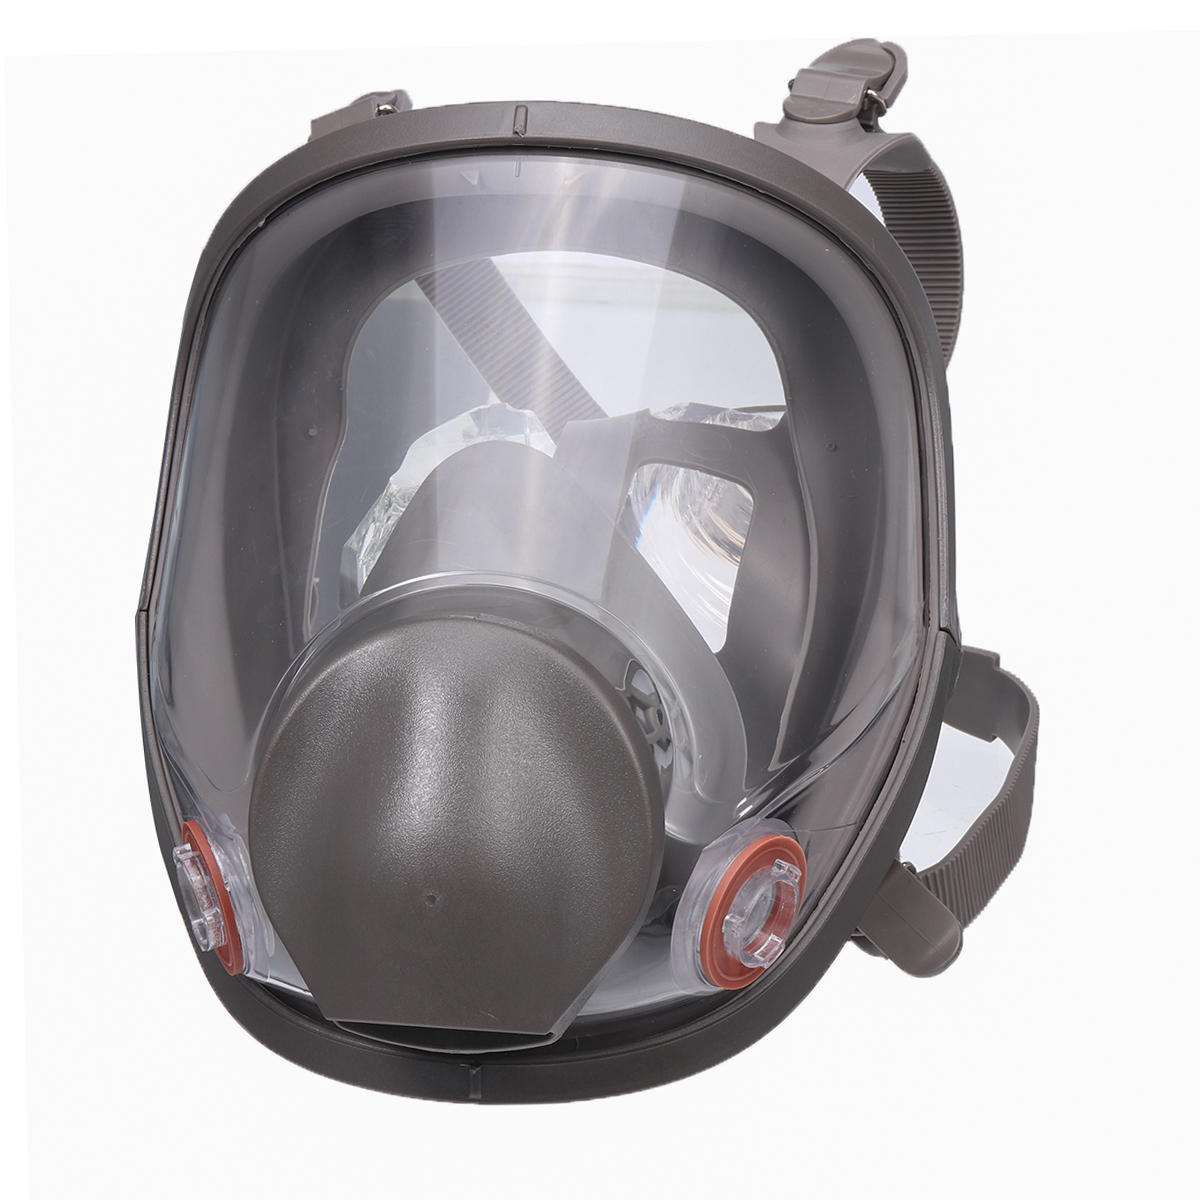 Reusable 6800 Full Face Gas Mask Spraying Painting Respirator Silicone Facepiece